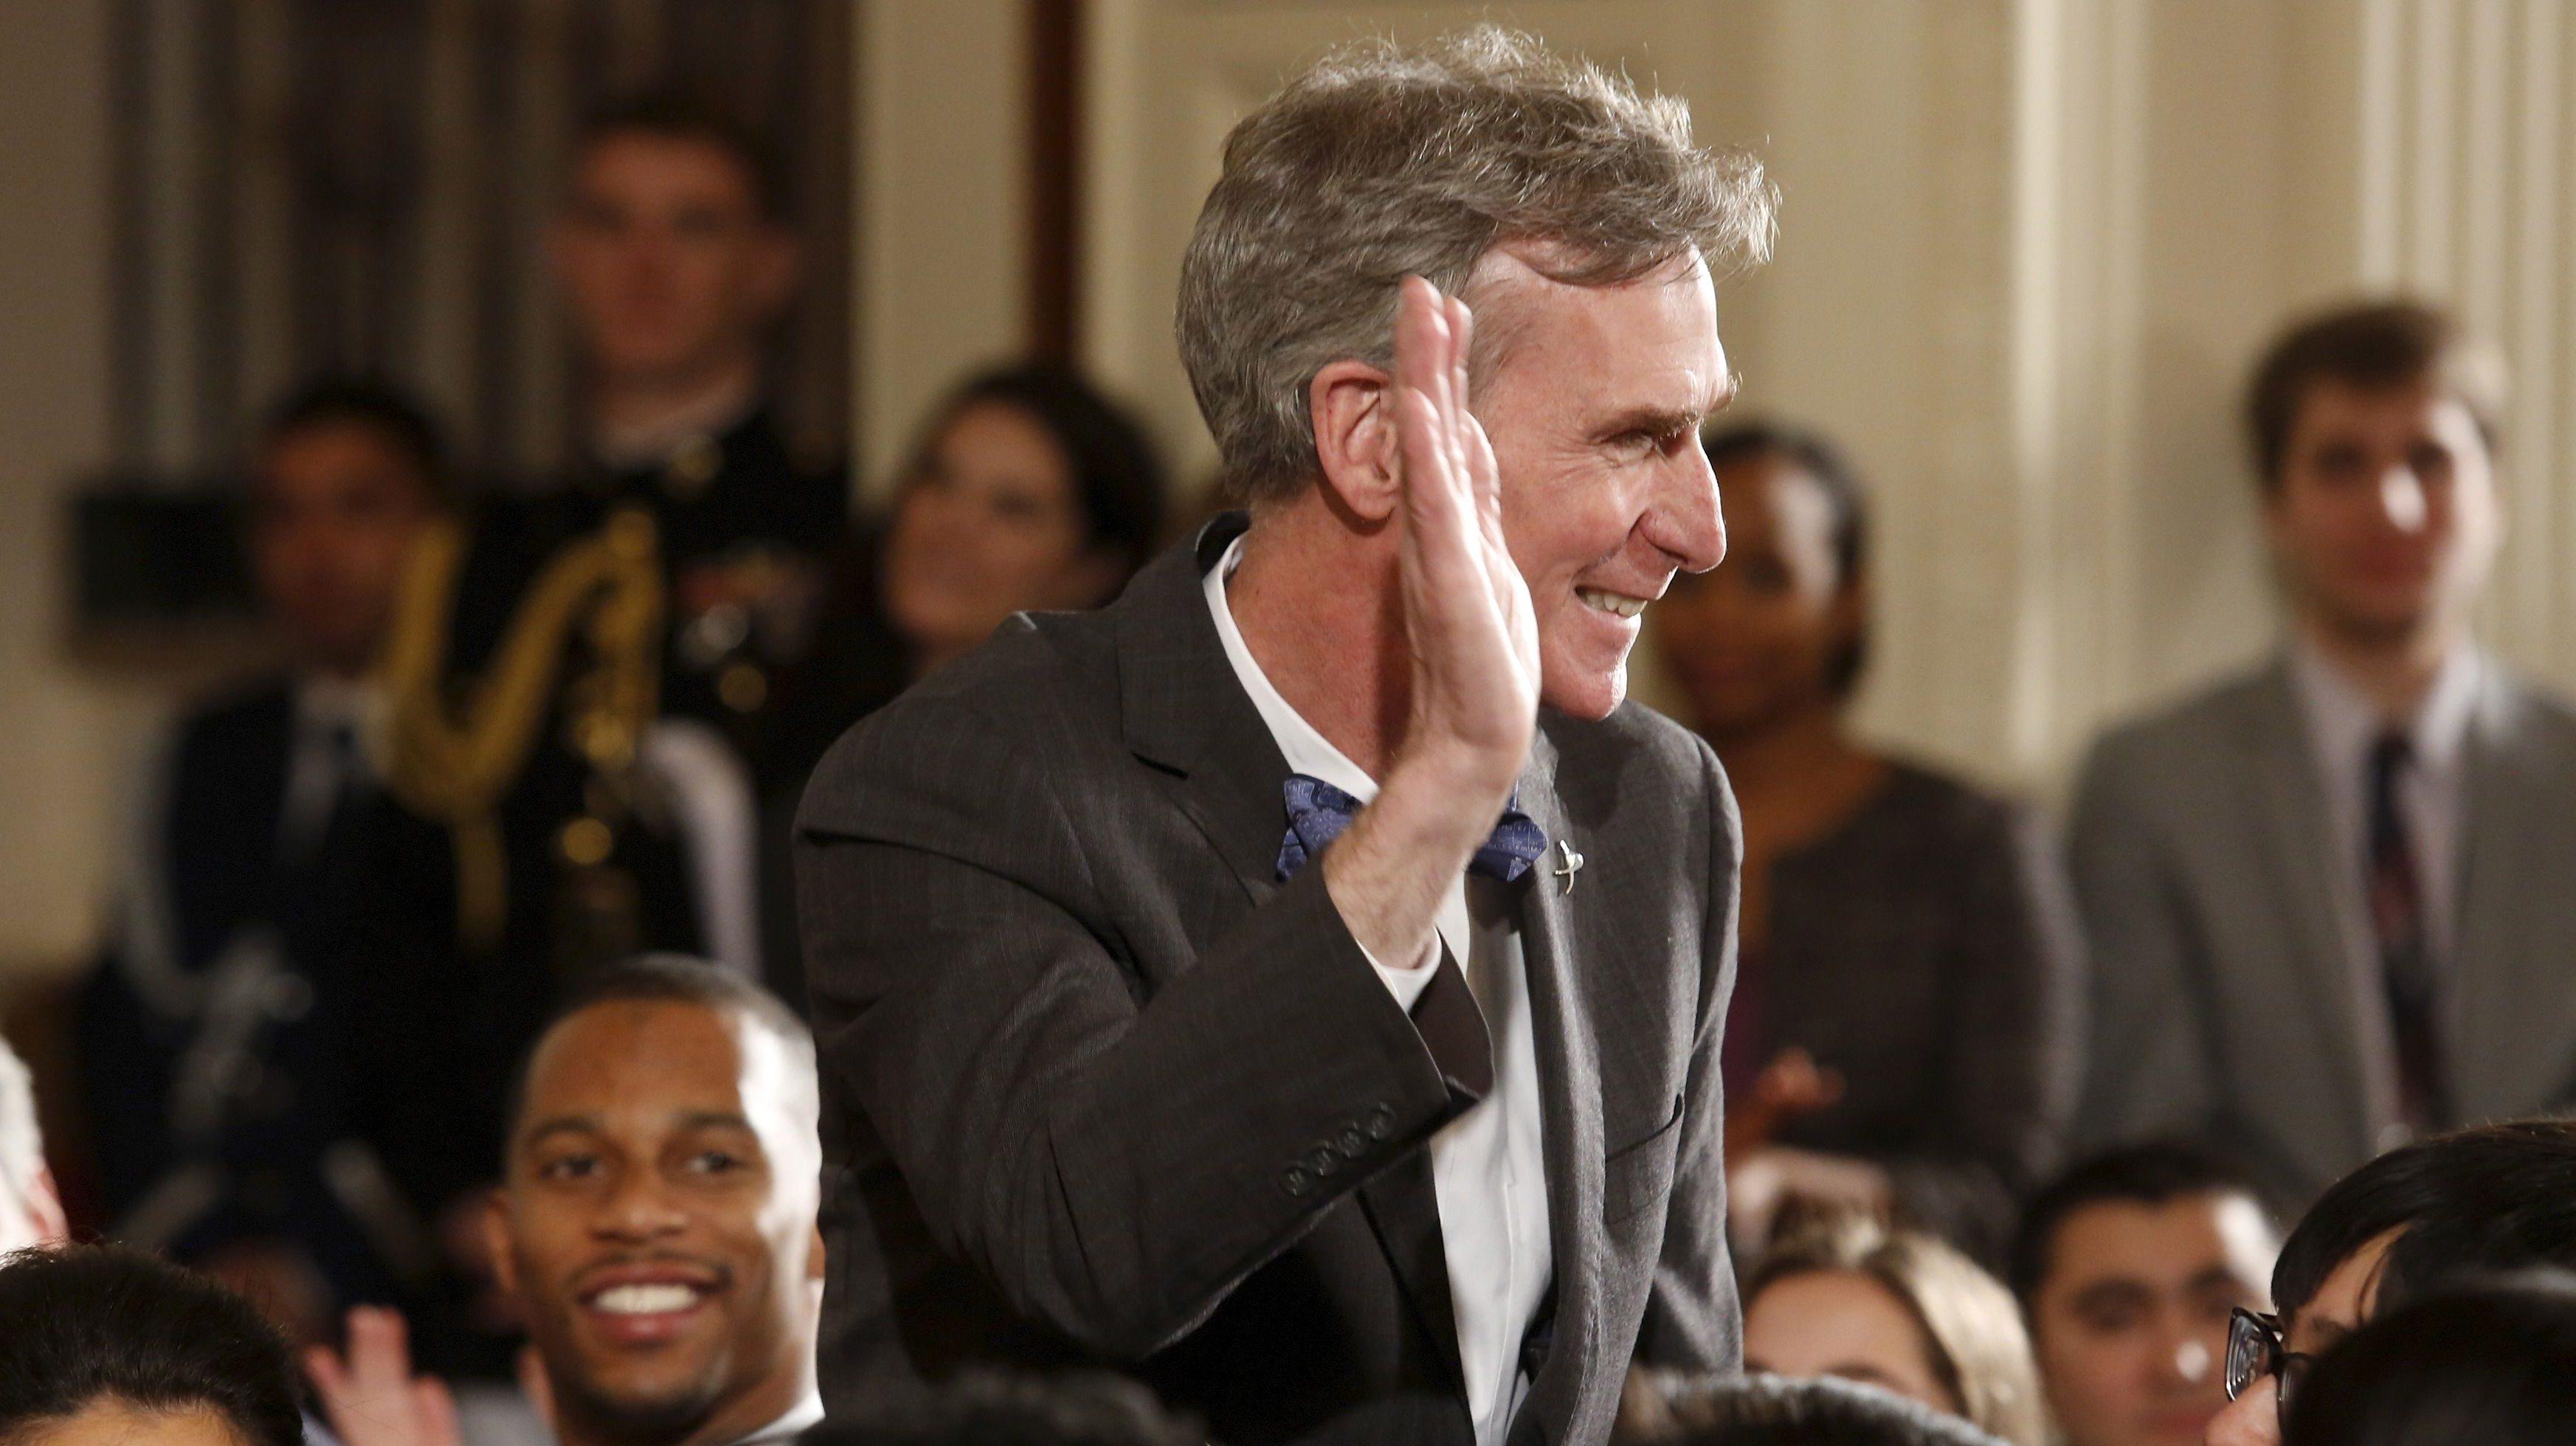 Bill Nye waving toward others.